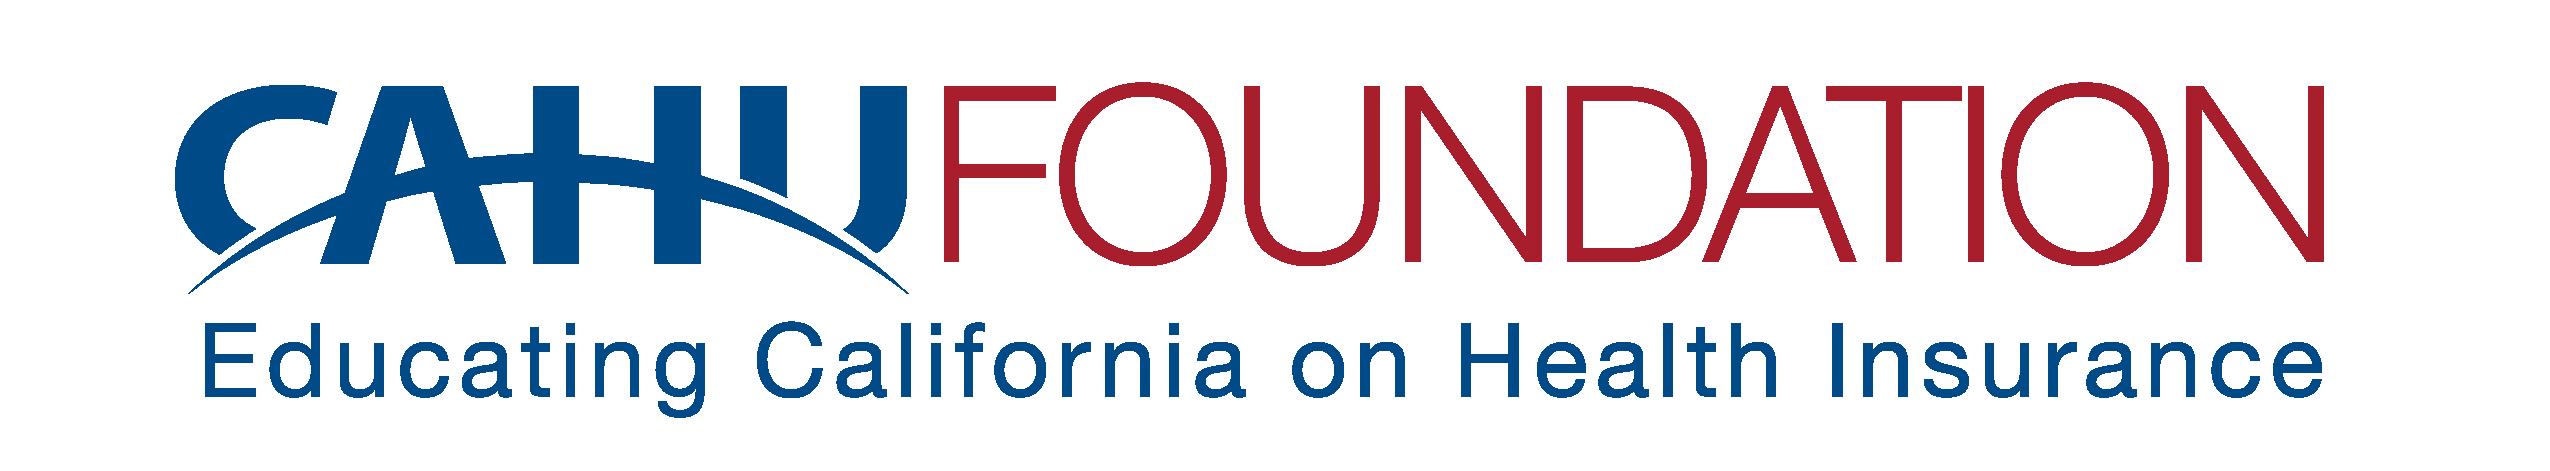 Foundation Logo-01